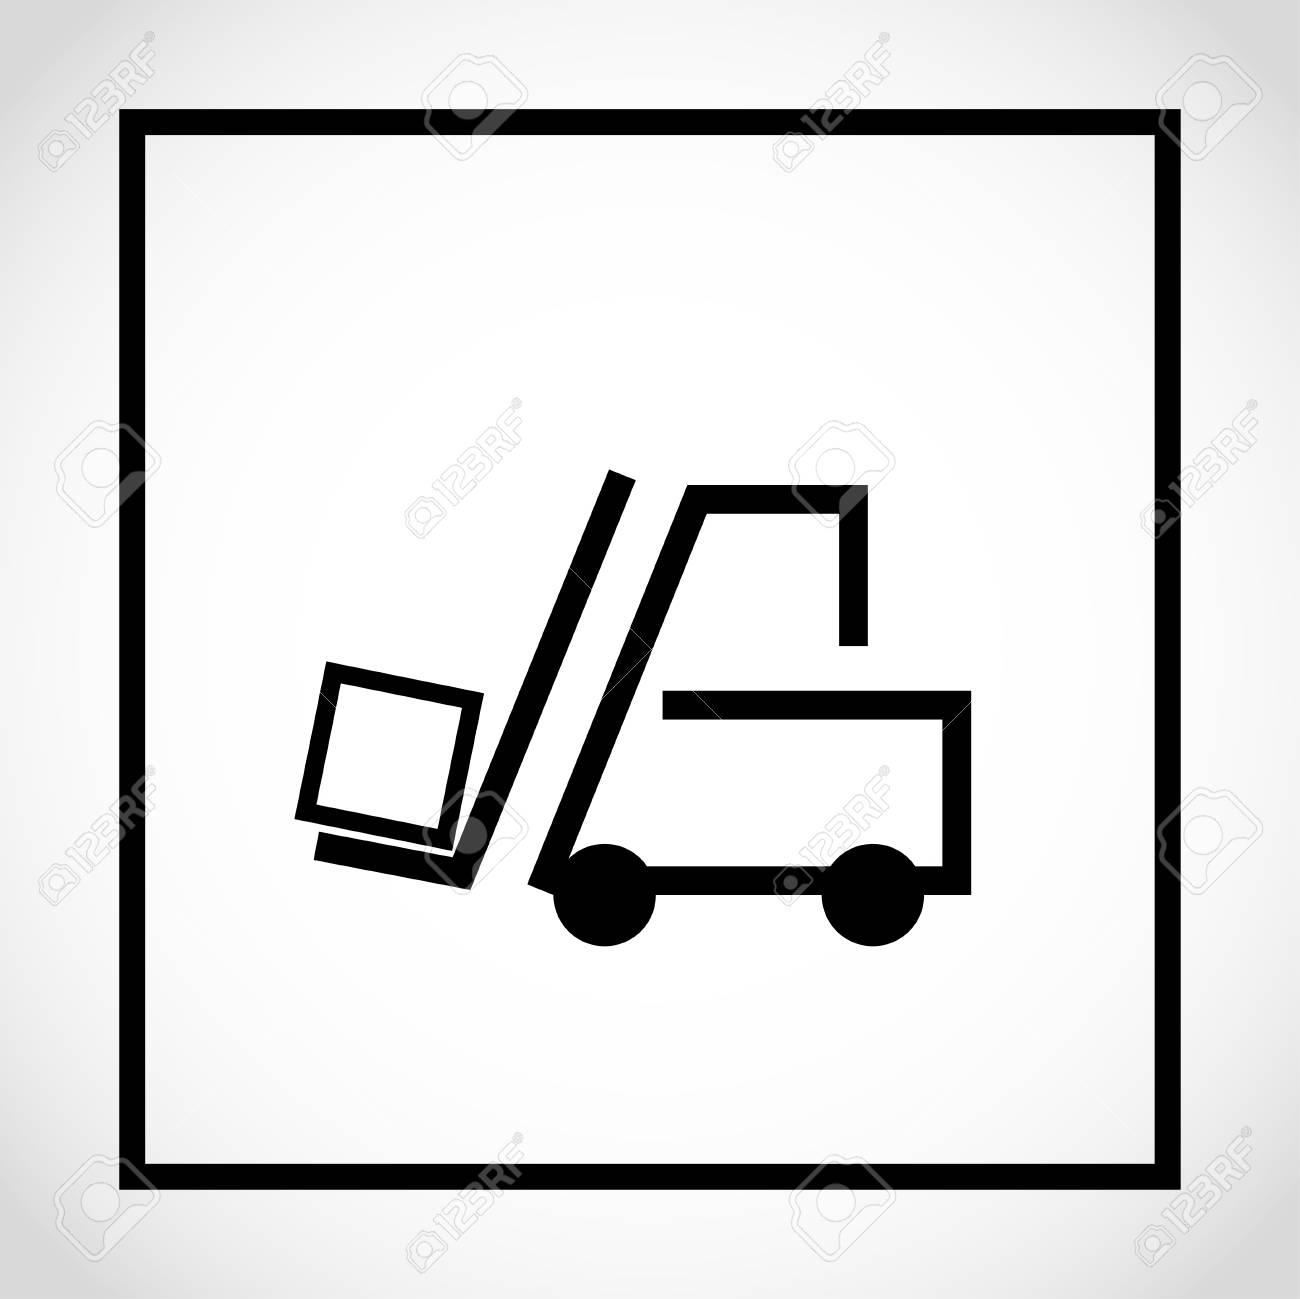 Use Forks Packaging Pictorial Marking For Handling Of Goods